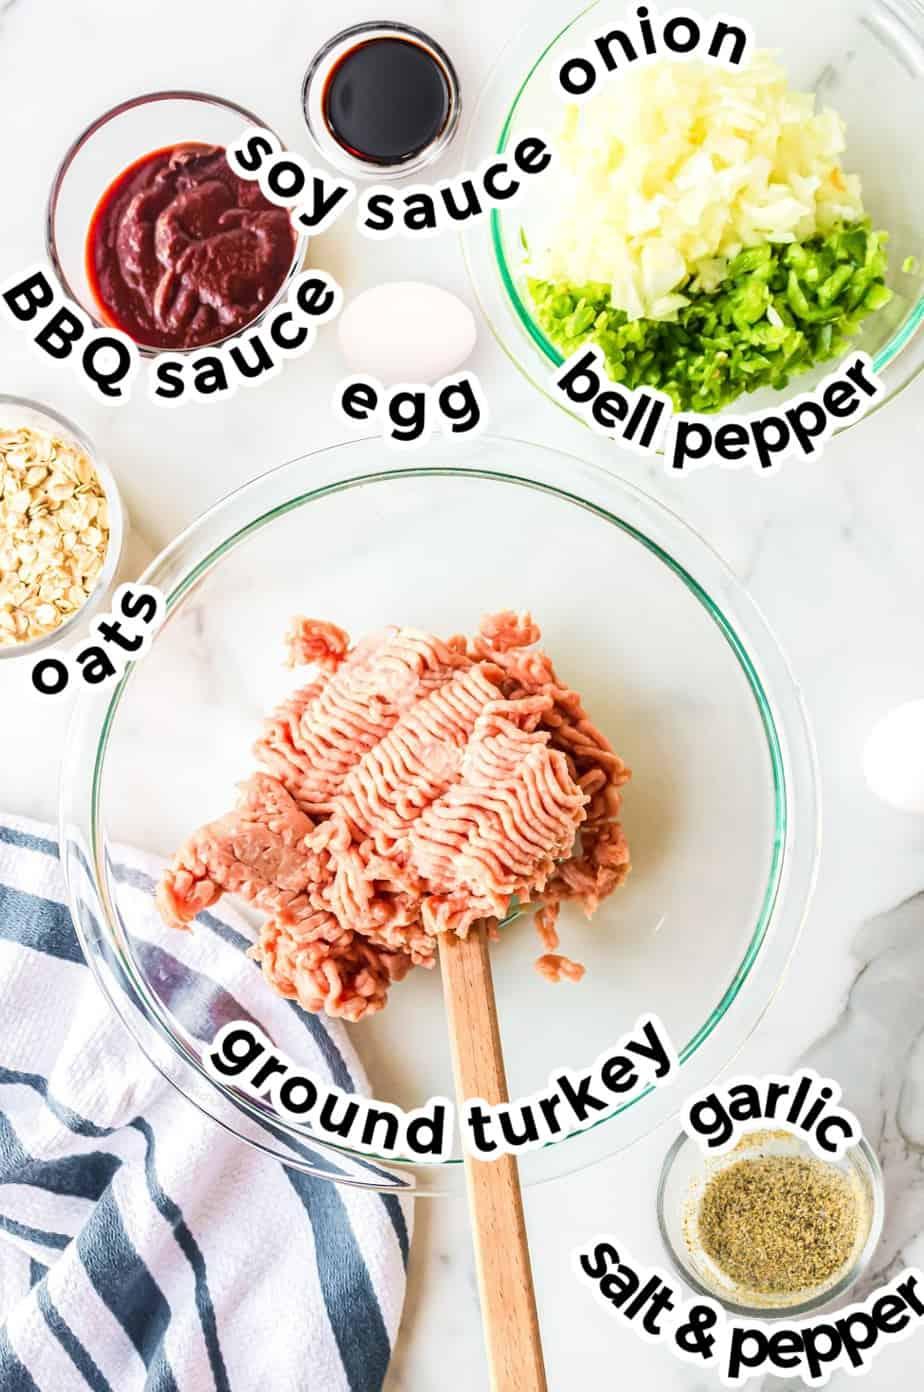 Ingredients for turkey meatloaf muffins